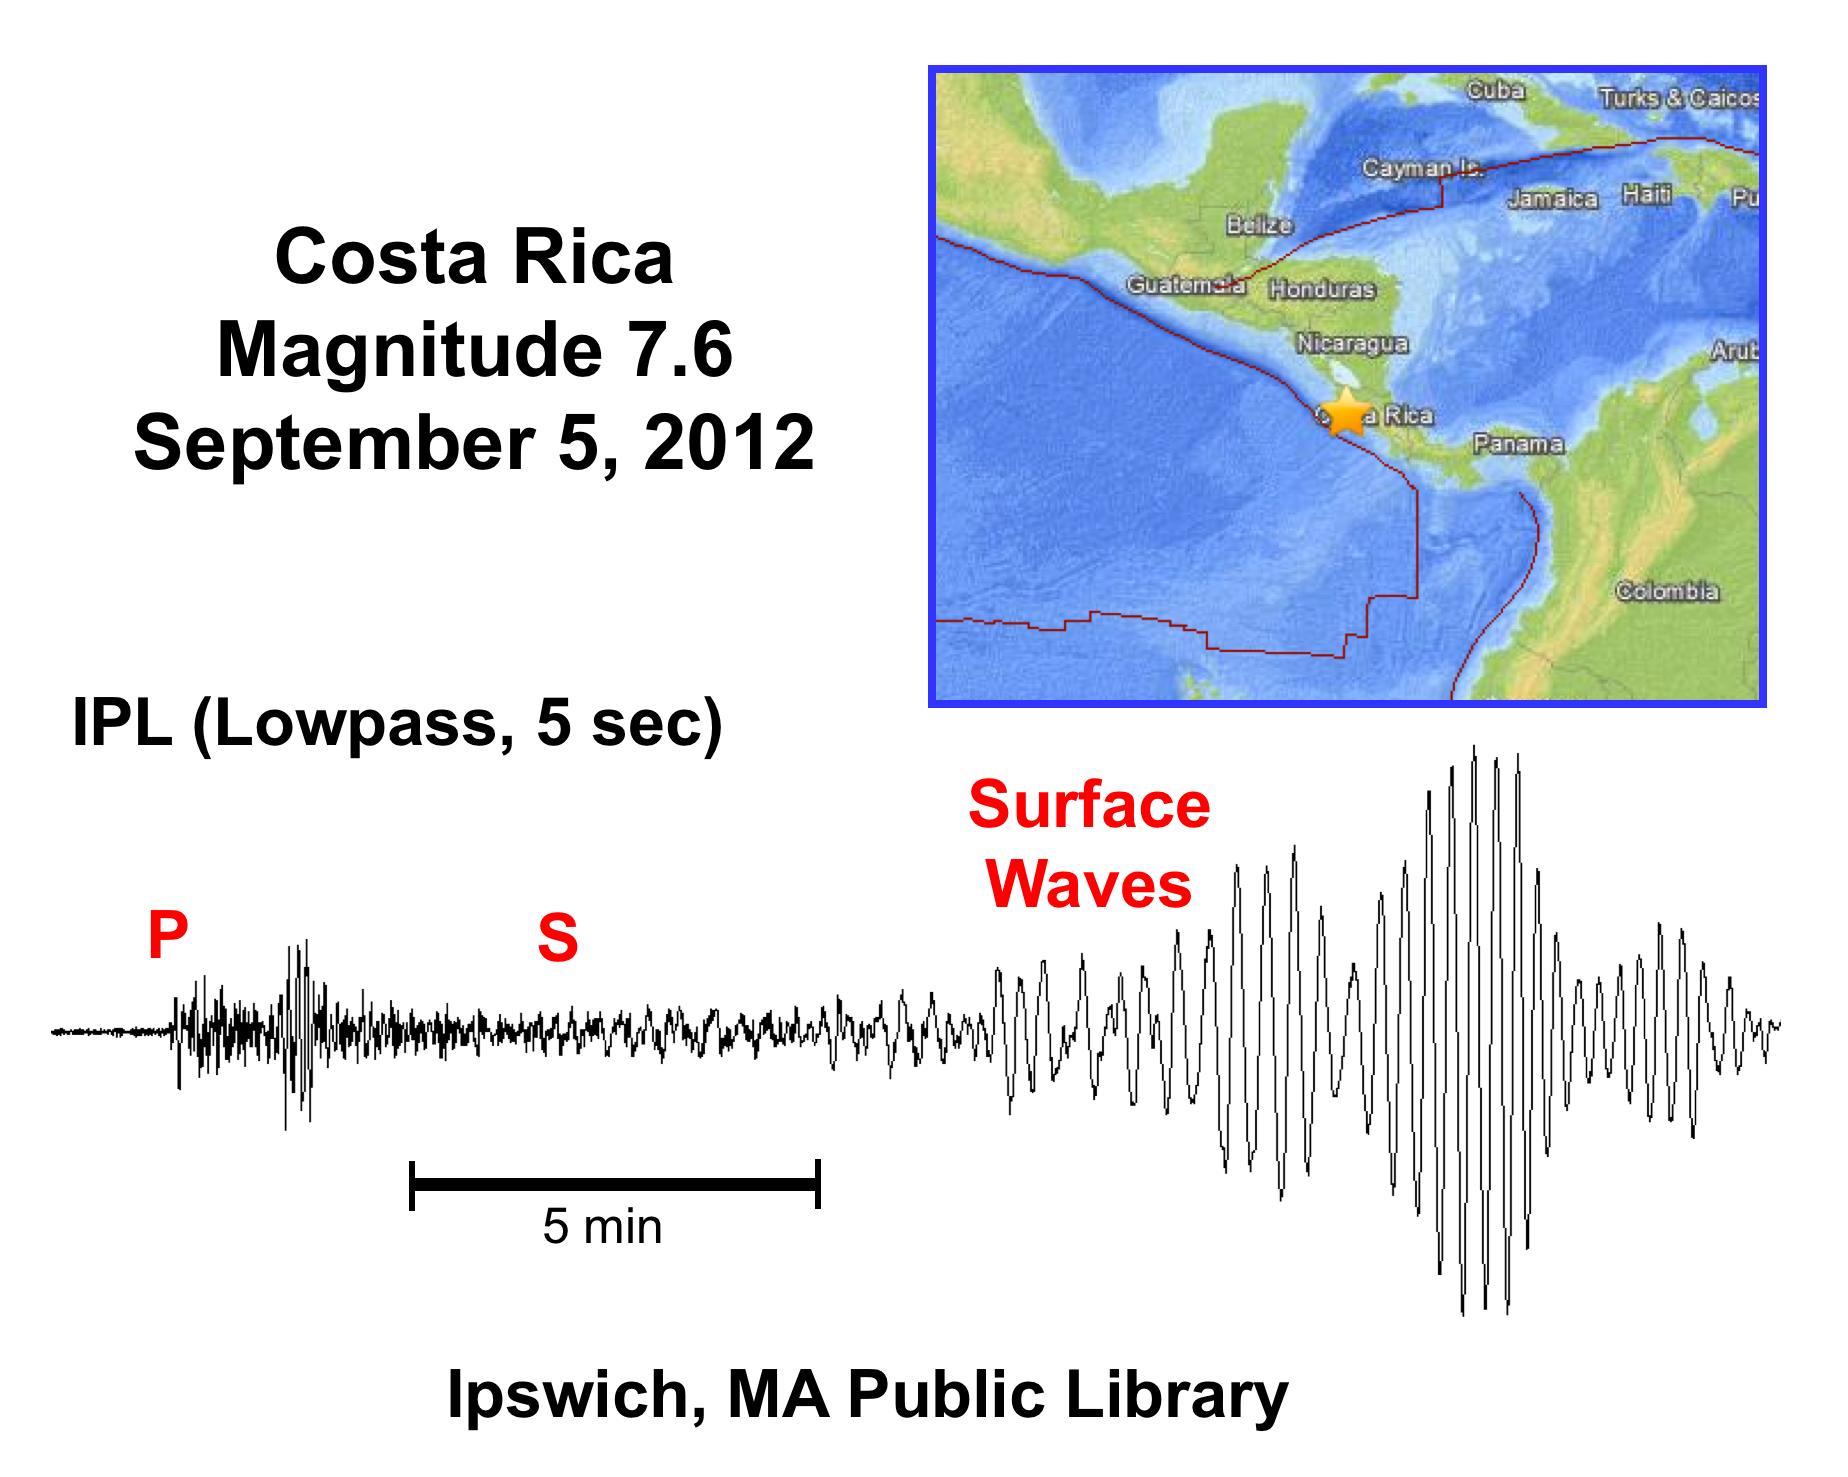 CostaRica_Seismogram